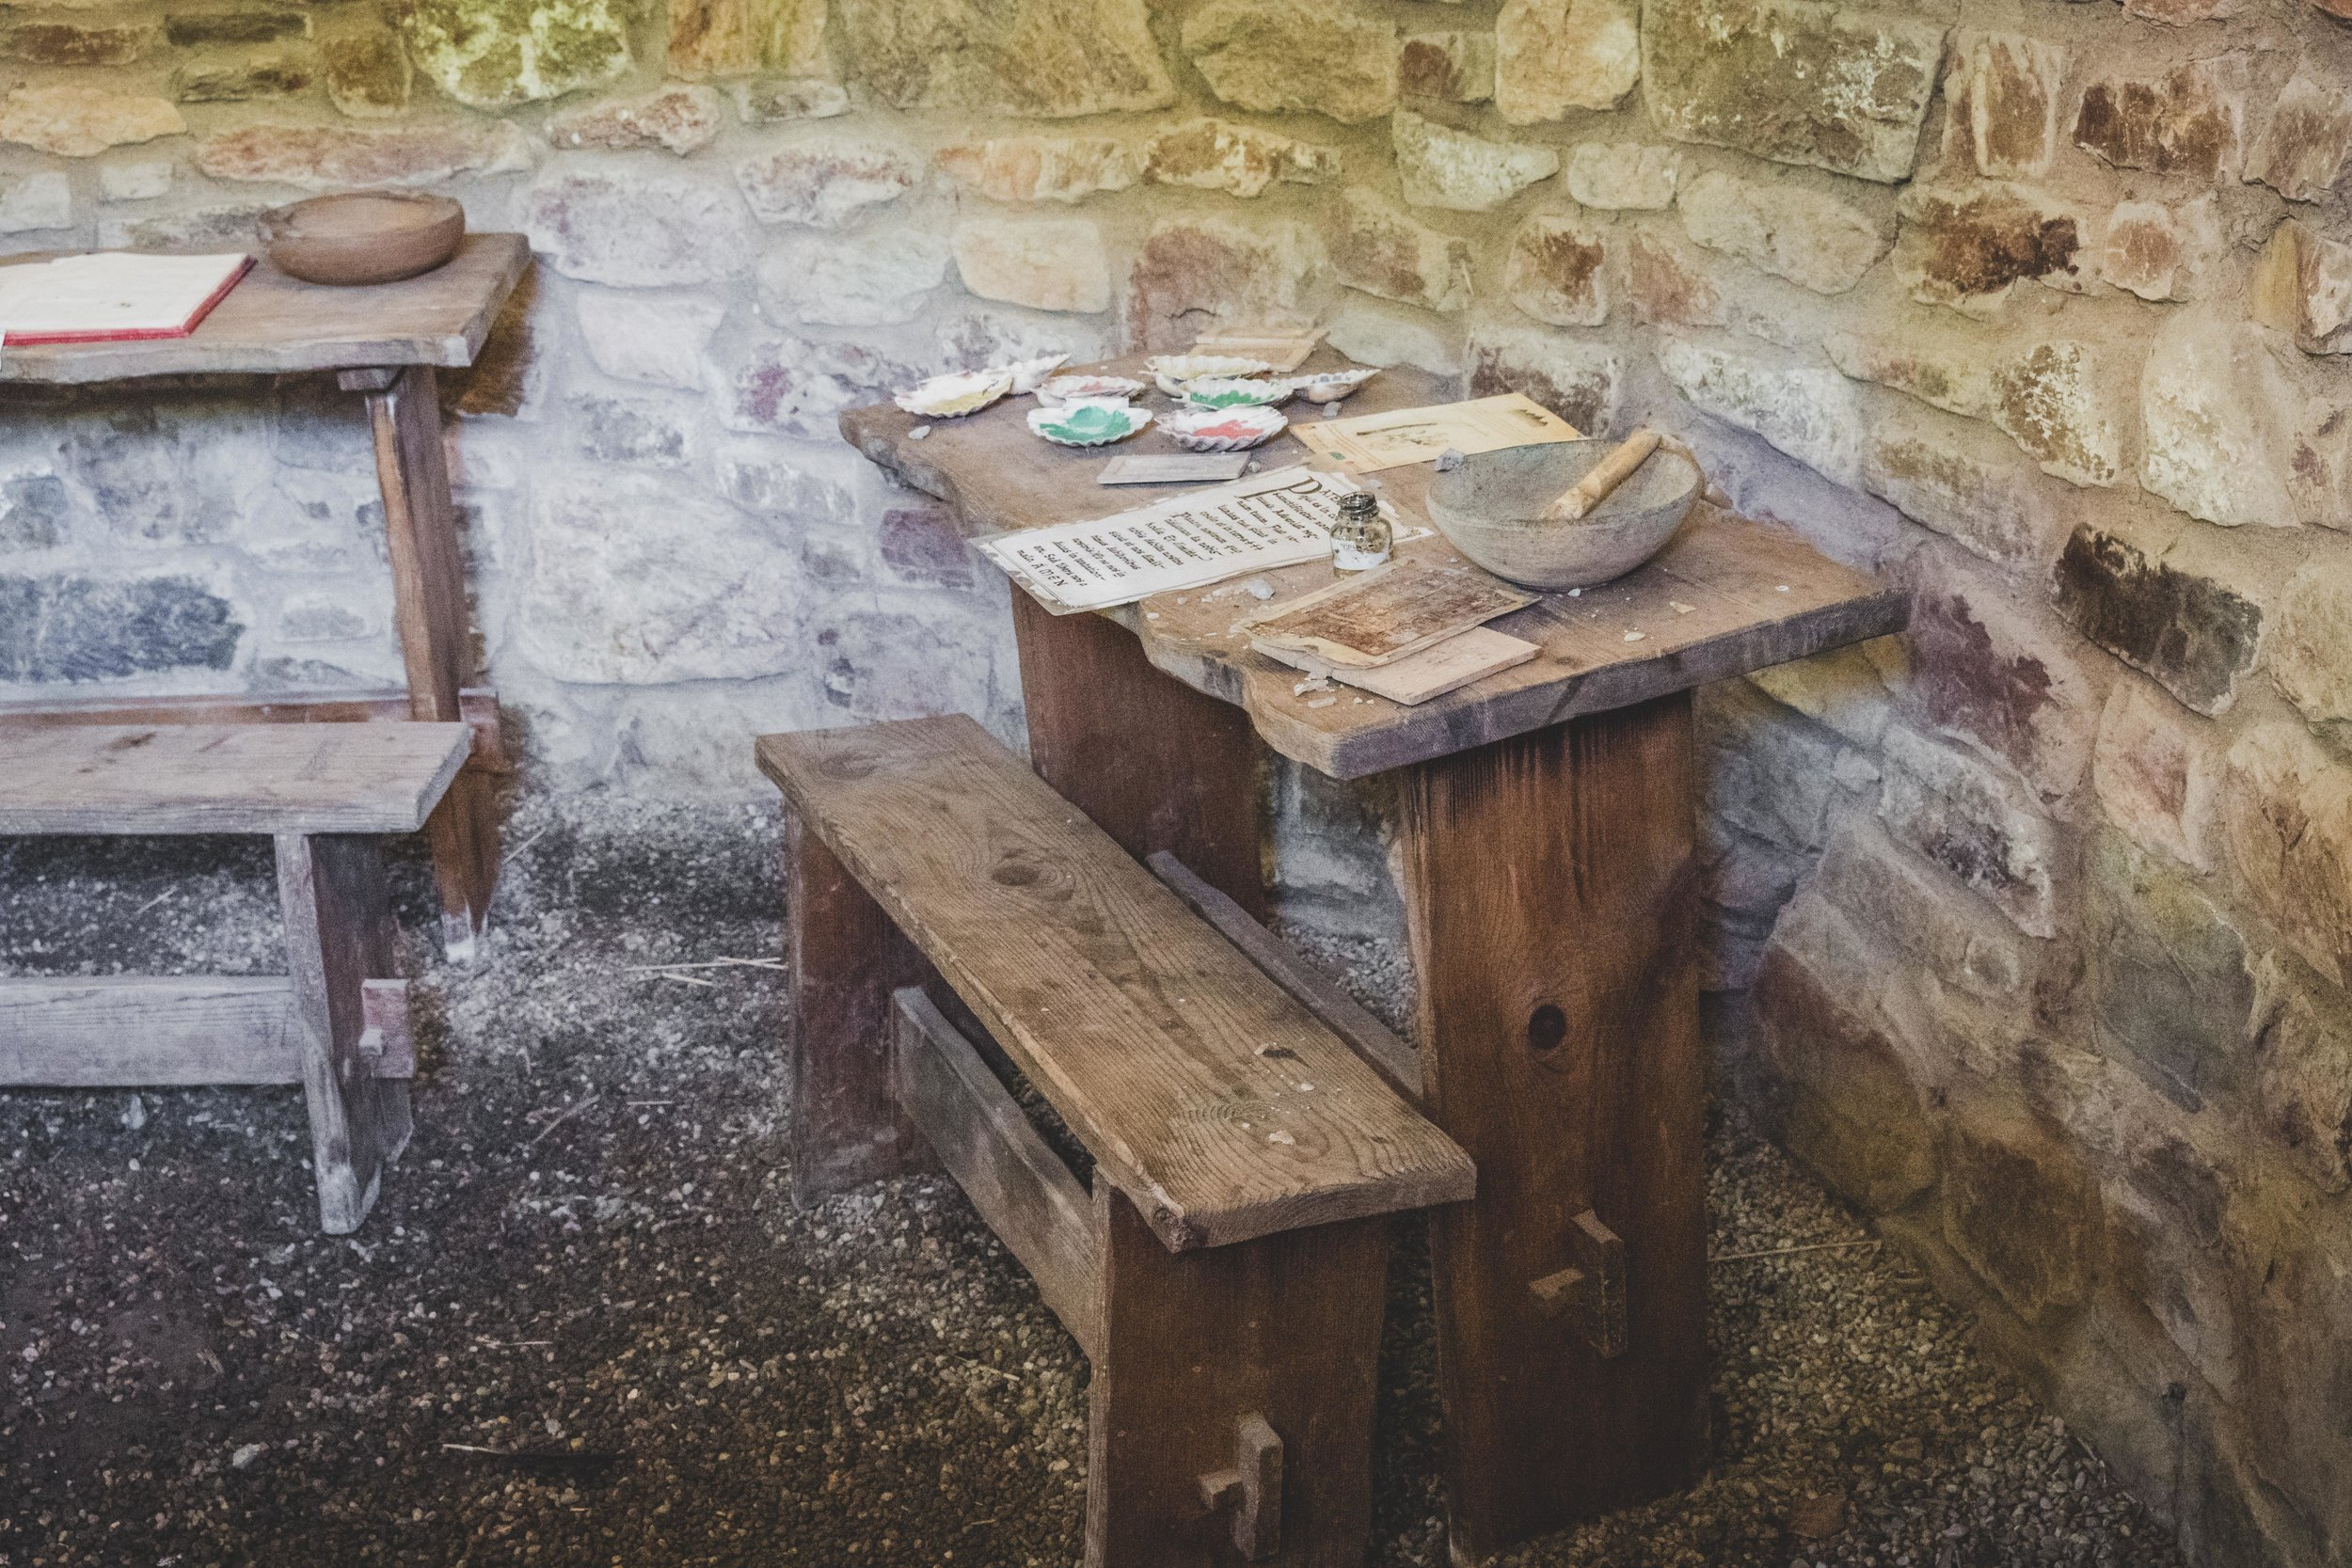 wexford heritage centre ireland monks writing desk.jpg